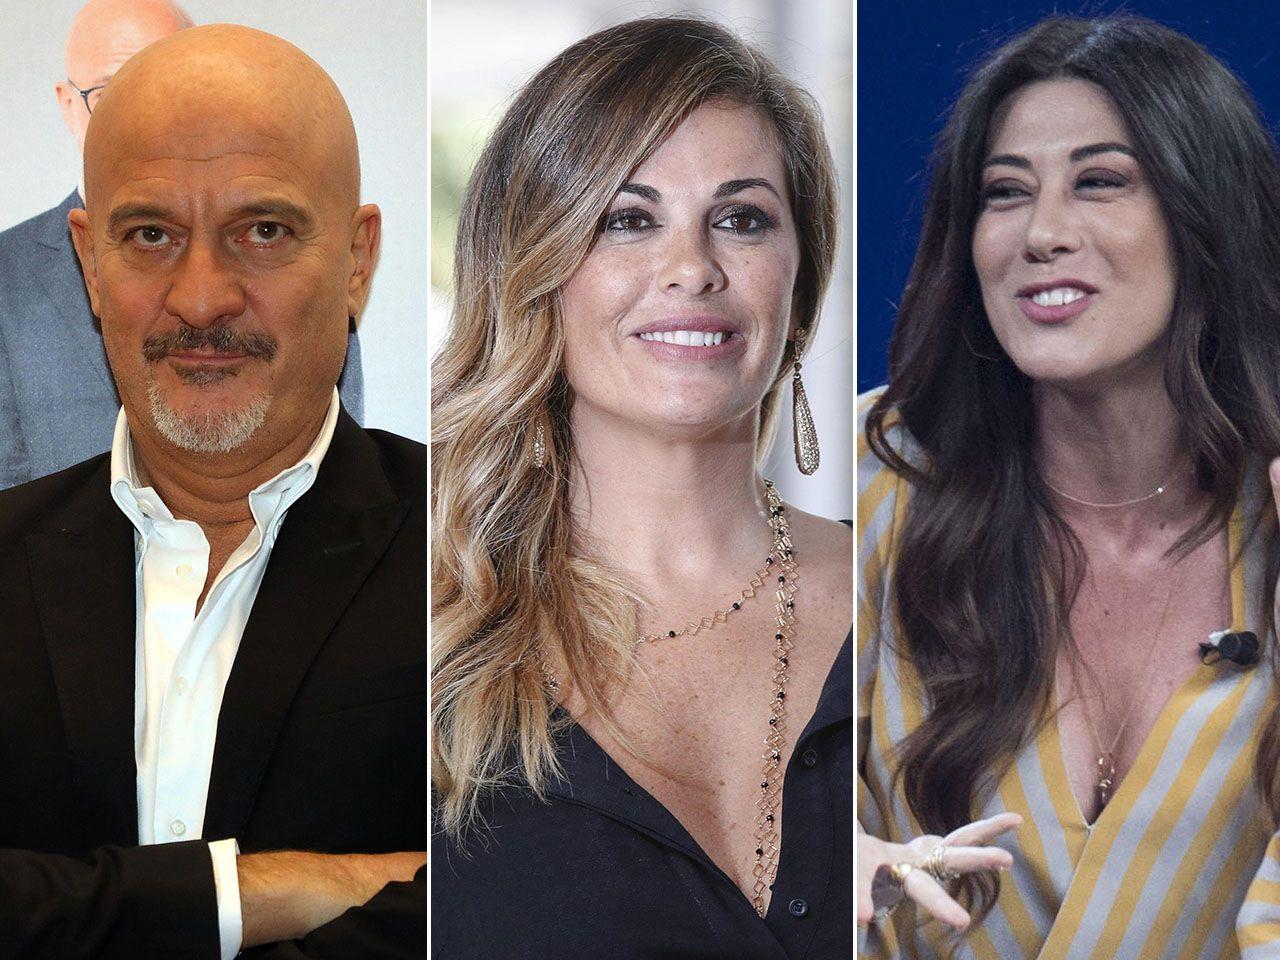 Sanremo 2019 conduzione a tre con Claudio Bisio Vanessa Incontrada Virginia Raffaele?